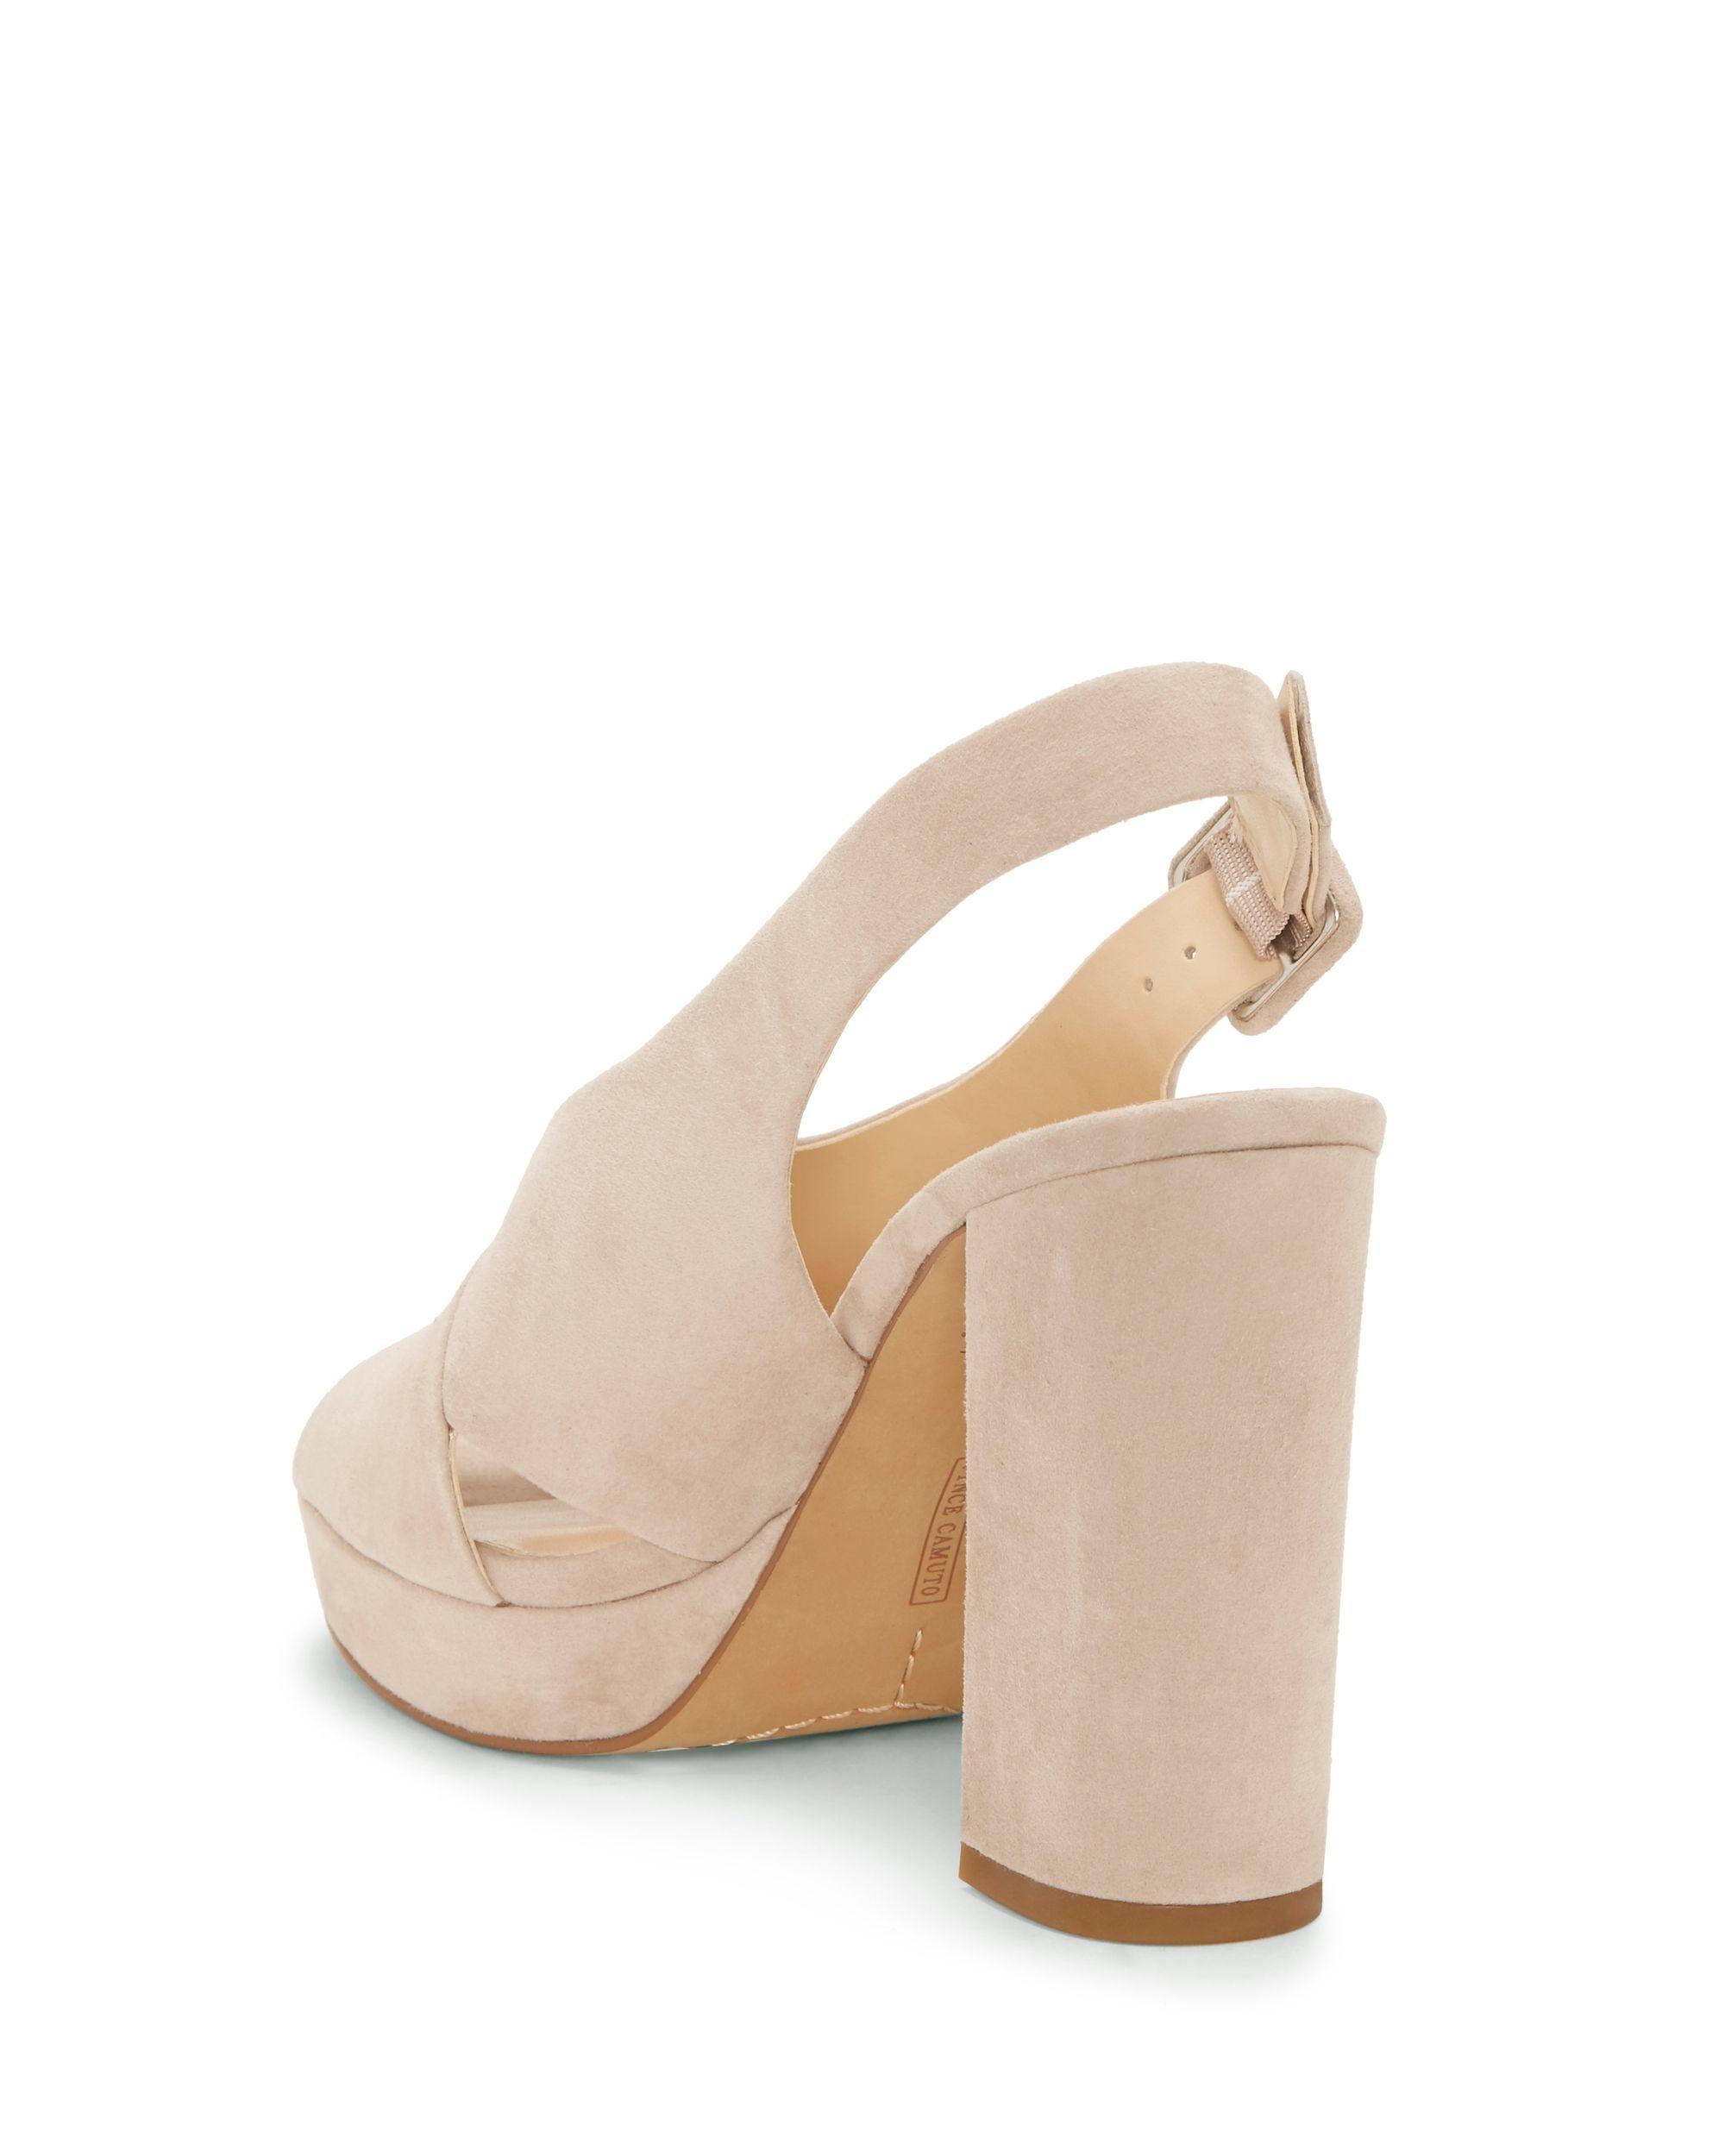 6f016c75552 Lyst - Vince Camuto Javasan – Platform Sandal in Natural - Save 1%